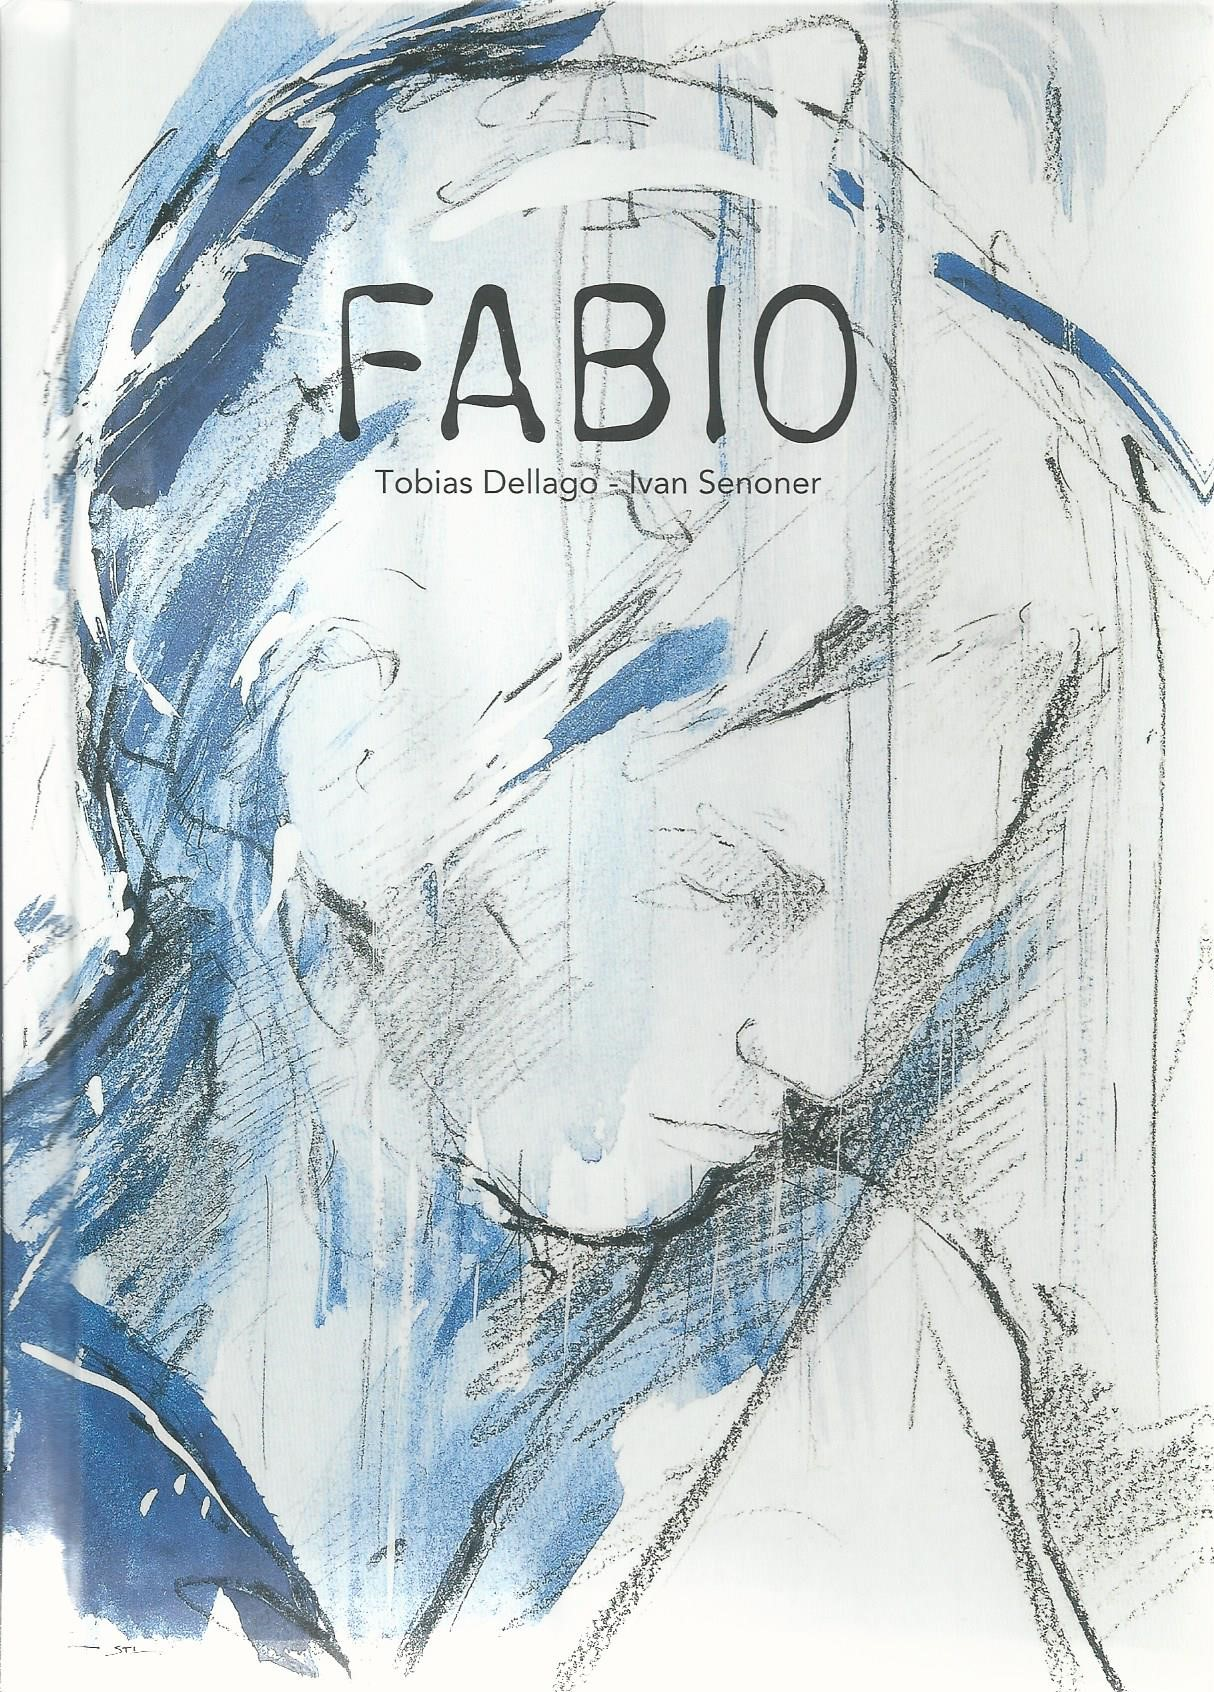 Fabio, Ivan Senoner, Tobias Dellago